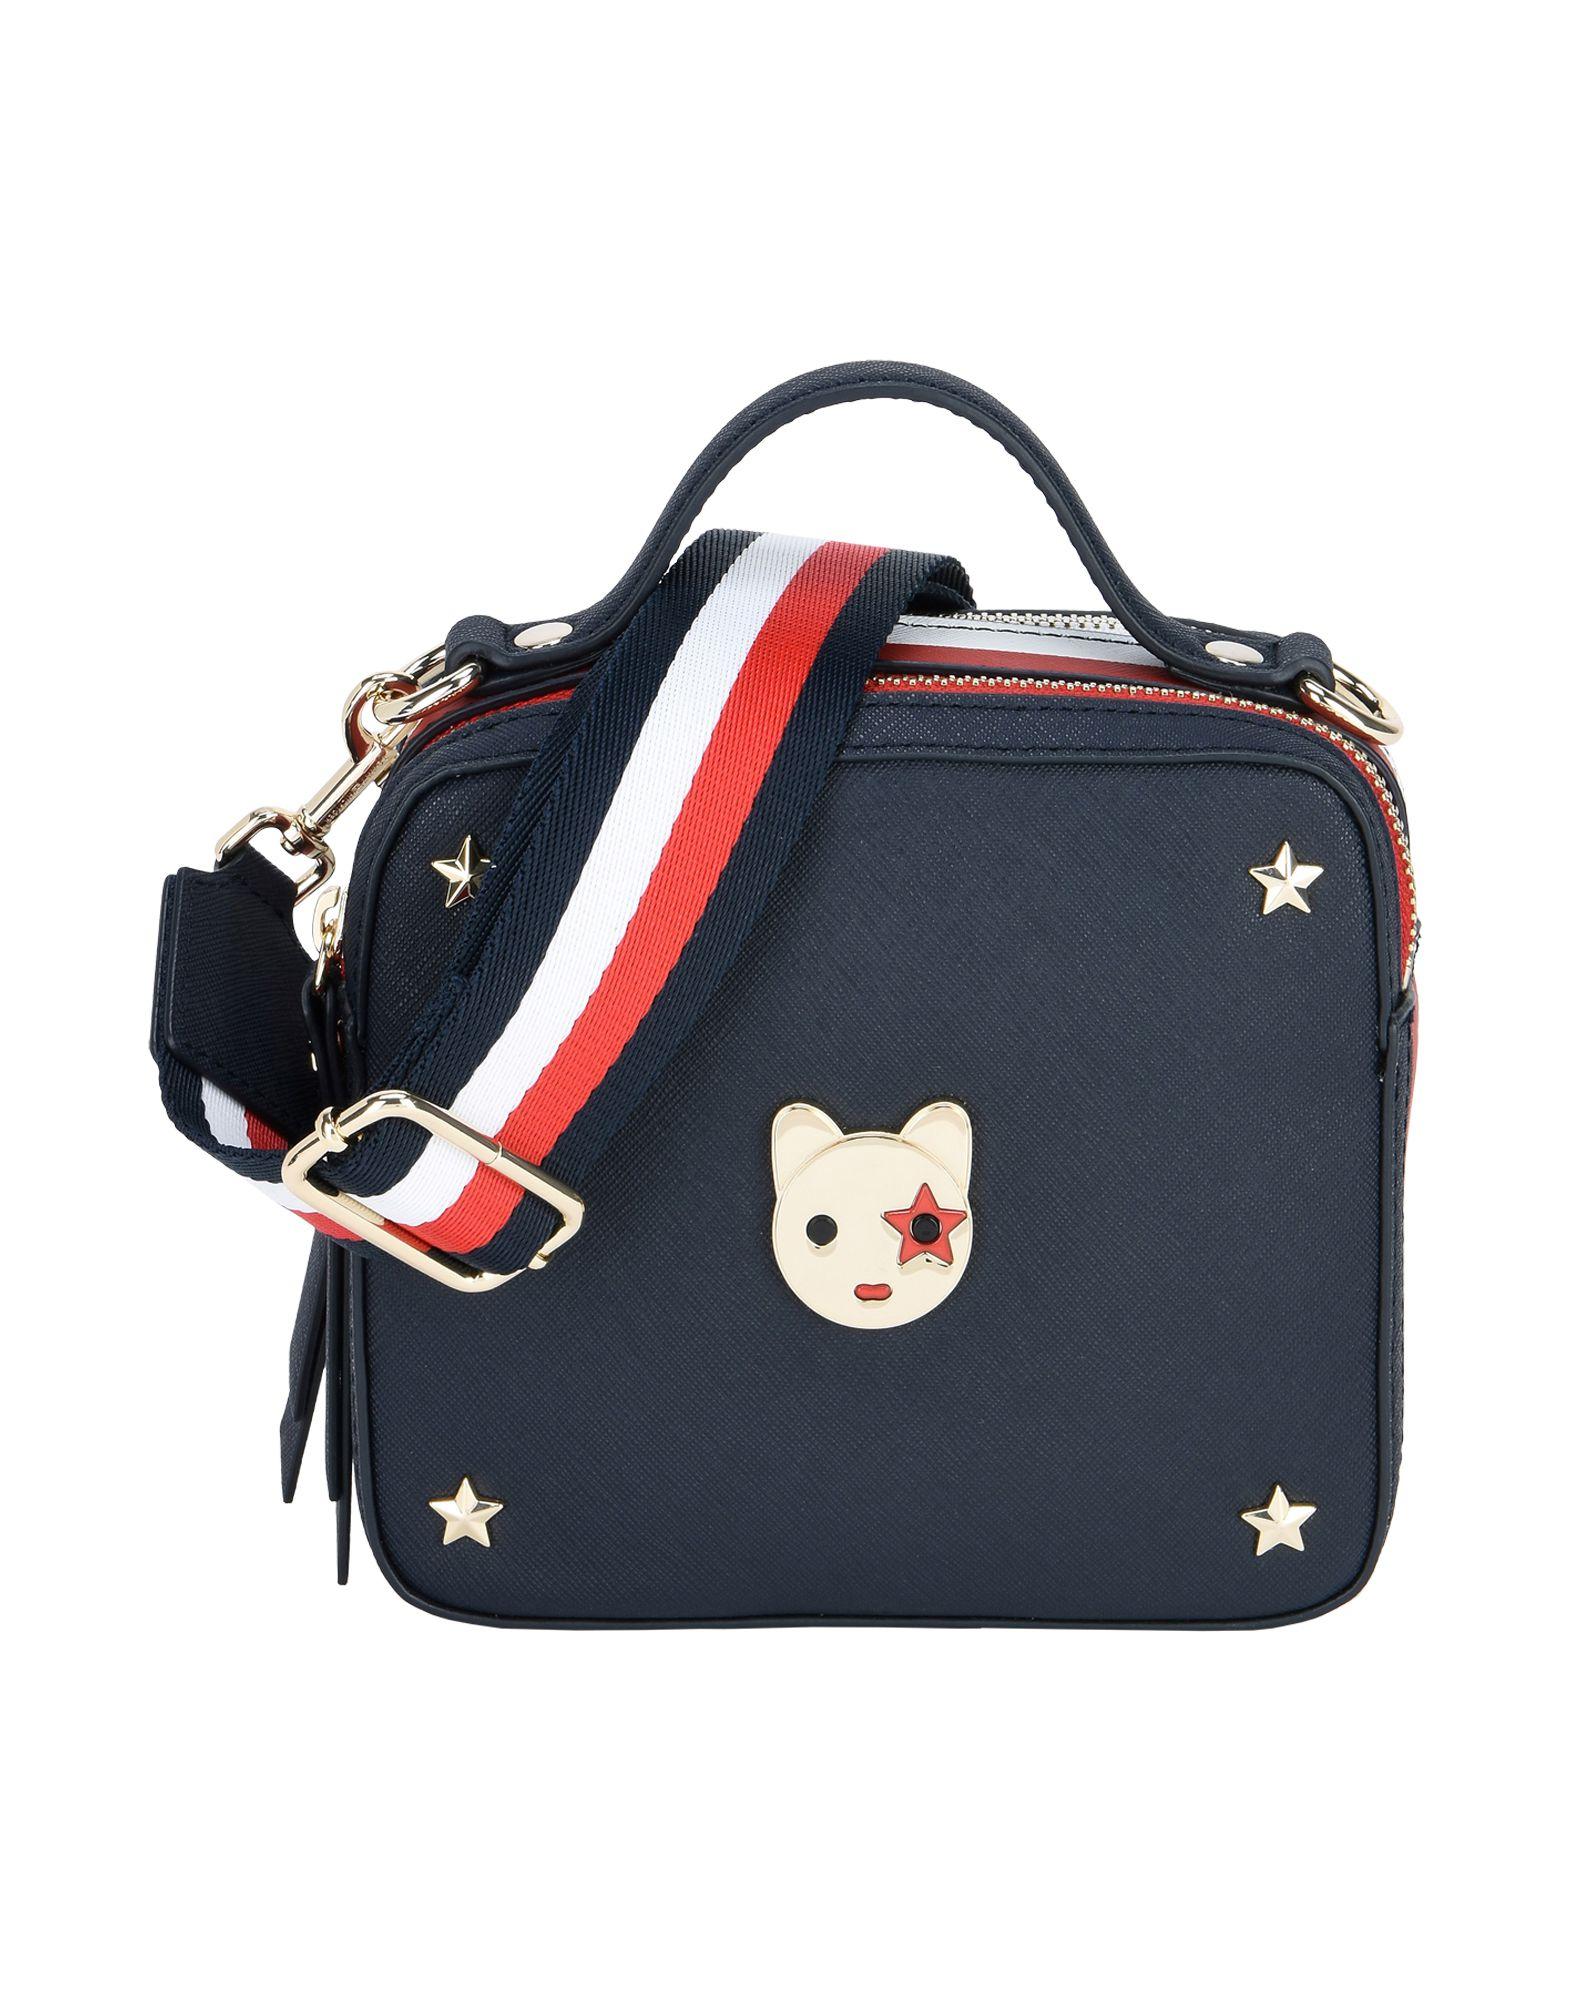 Borsa A Mano Tommy Hilfiger Camera Bag Icon Fancy Strap Corp - Donna - Acquista online su